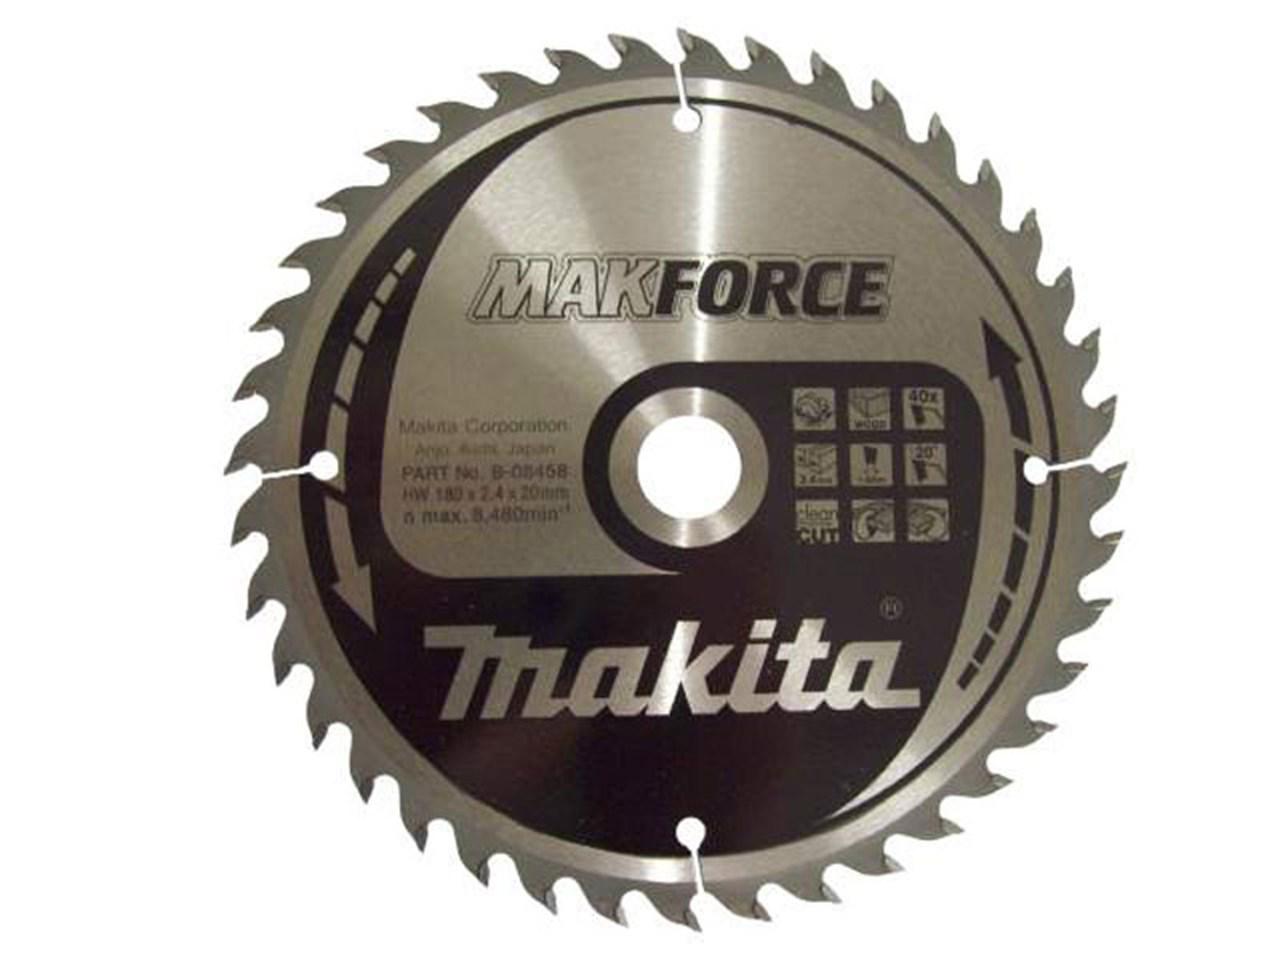 Makita b 08458 180mm x 20mm x 40t circular saw blade makforce keyboard keysfo Images